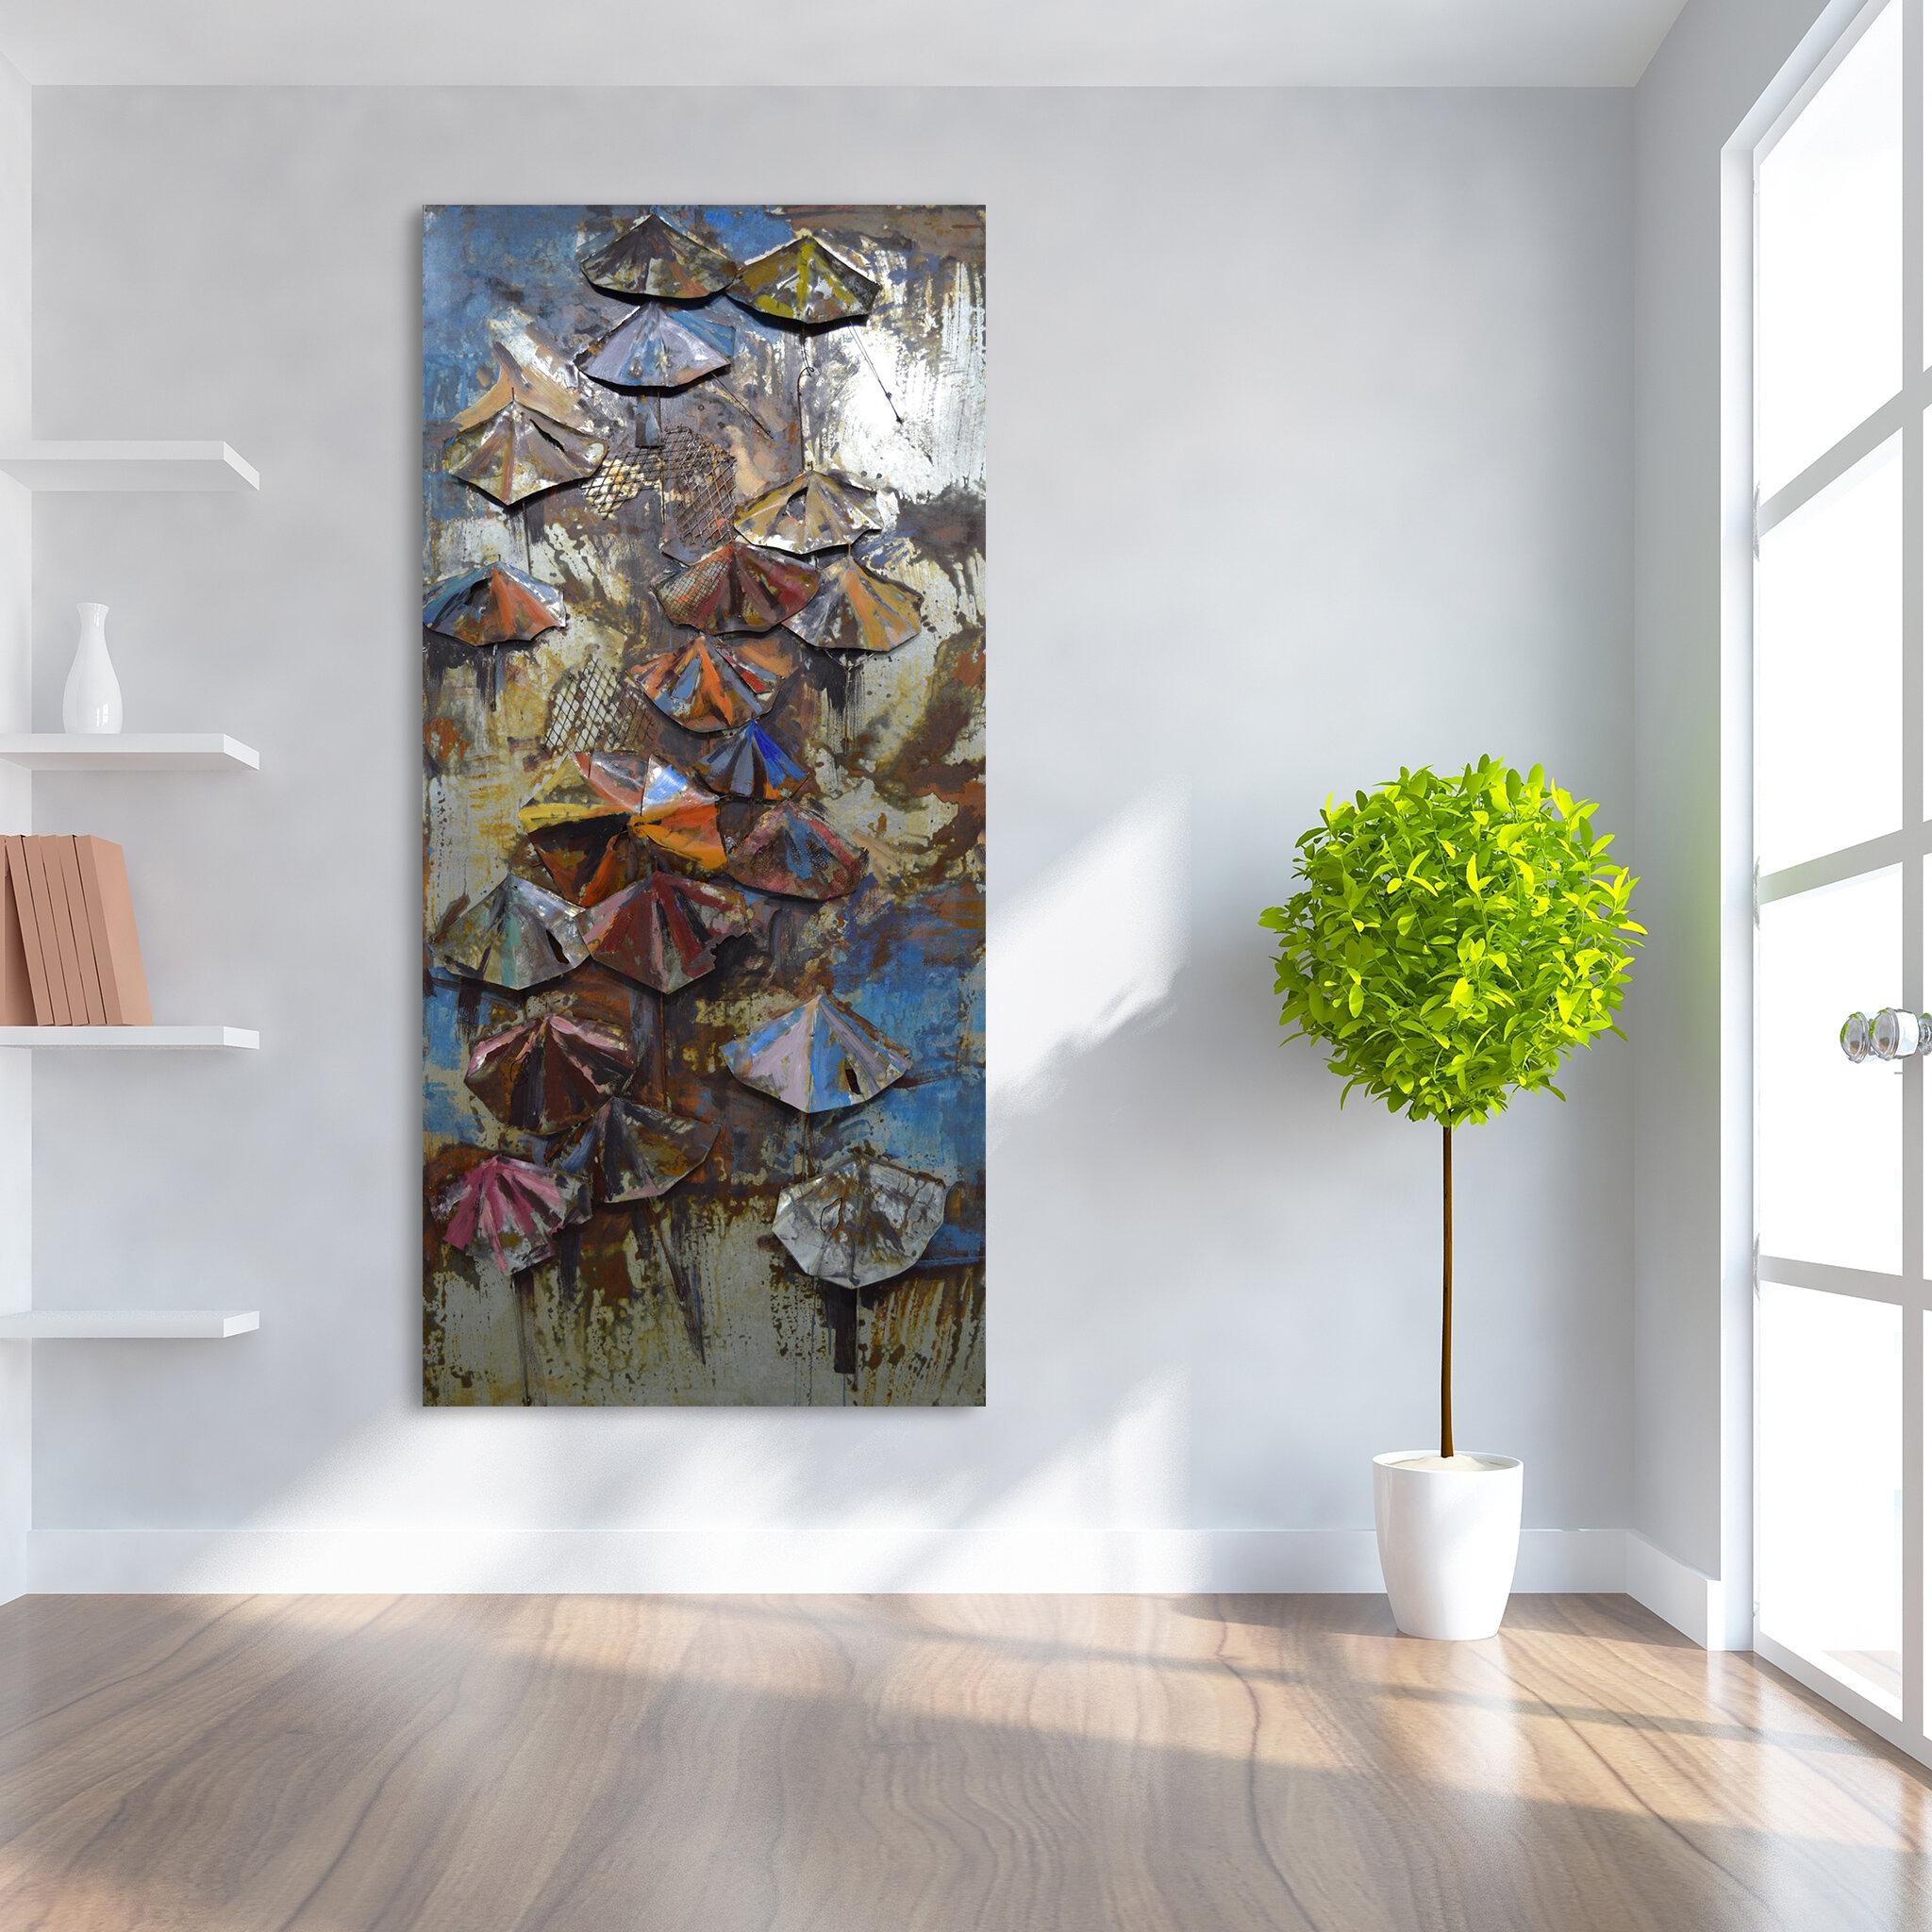 Umbrella Mariposa Wall Decor | Wayfair With Regard To Mariposa 9 Piece Wall Decor (View 29 of 30)